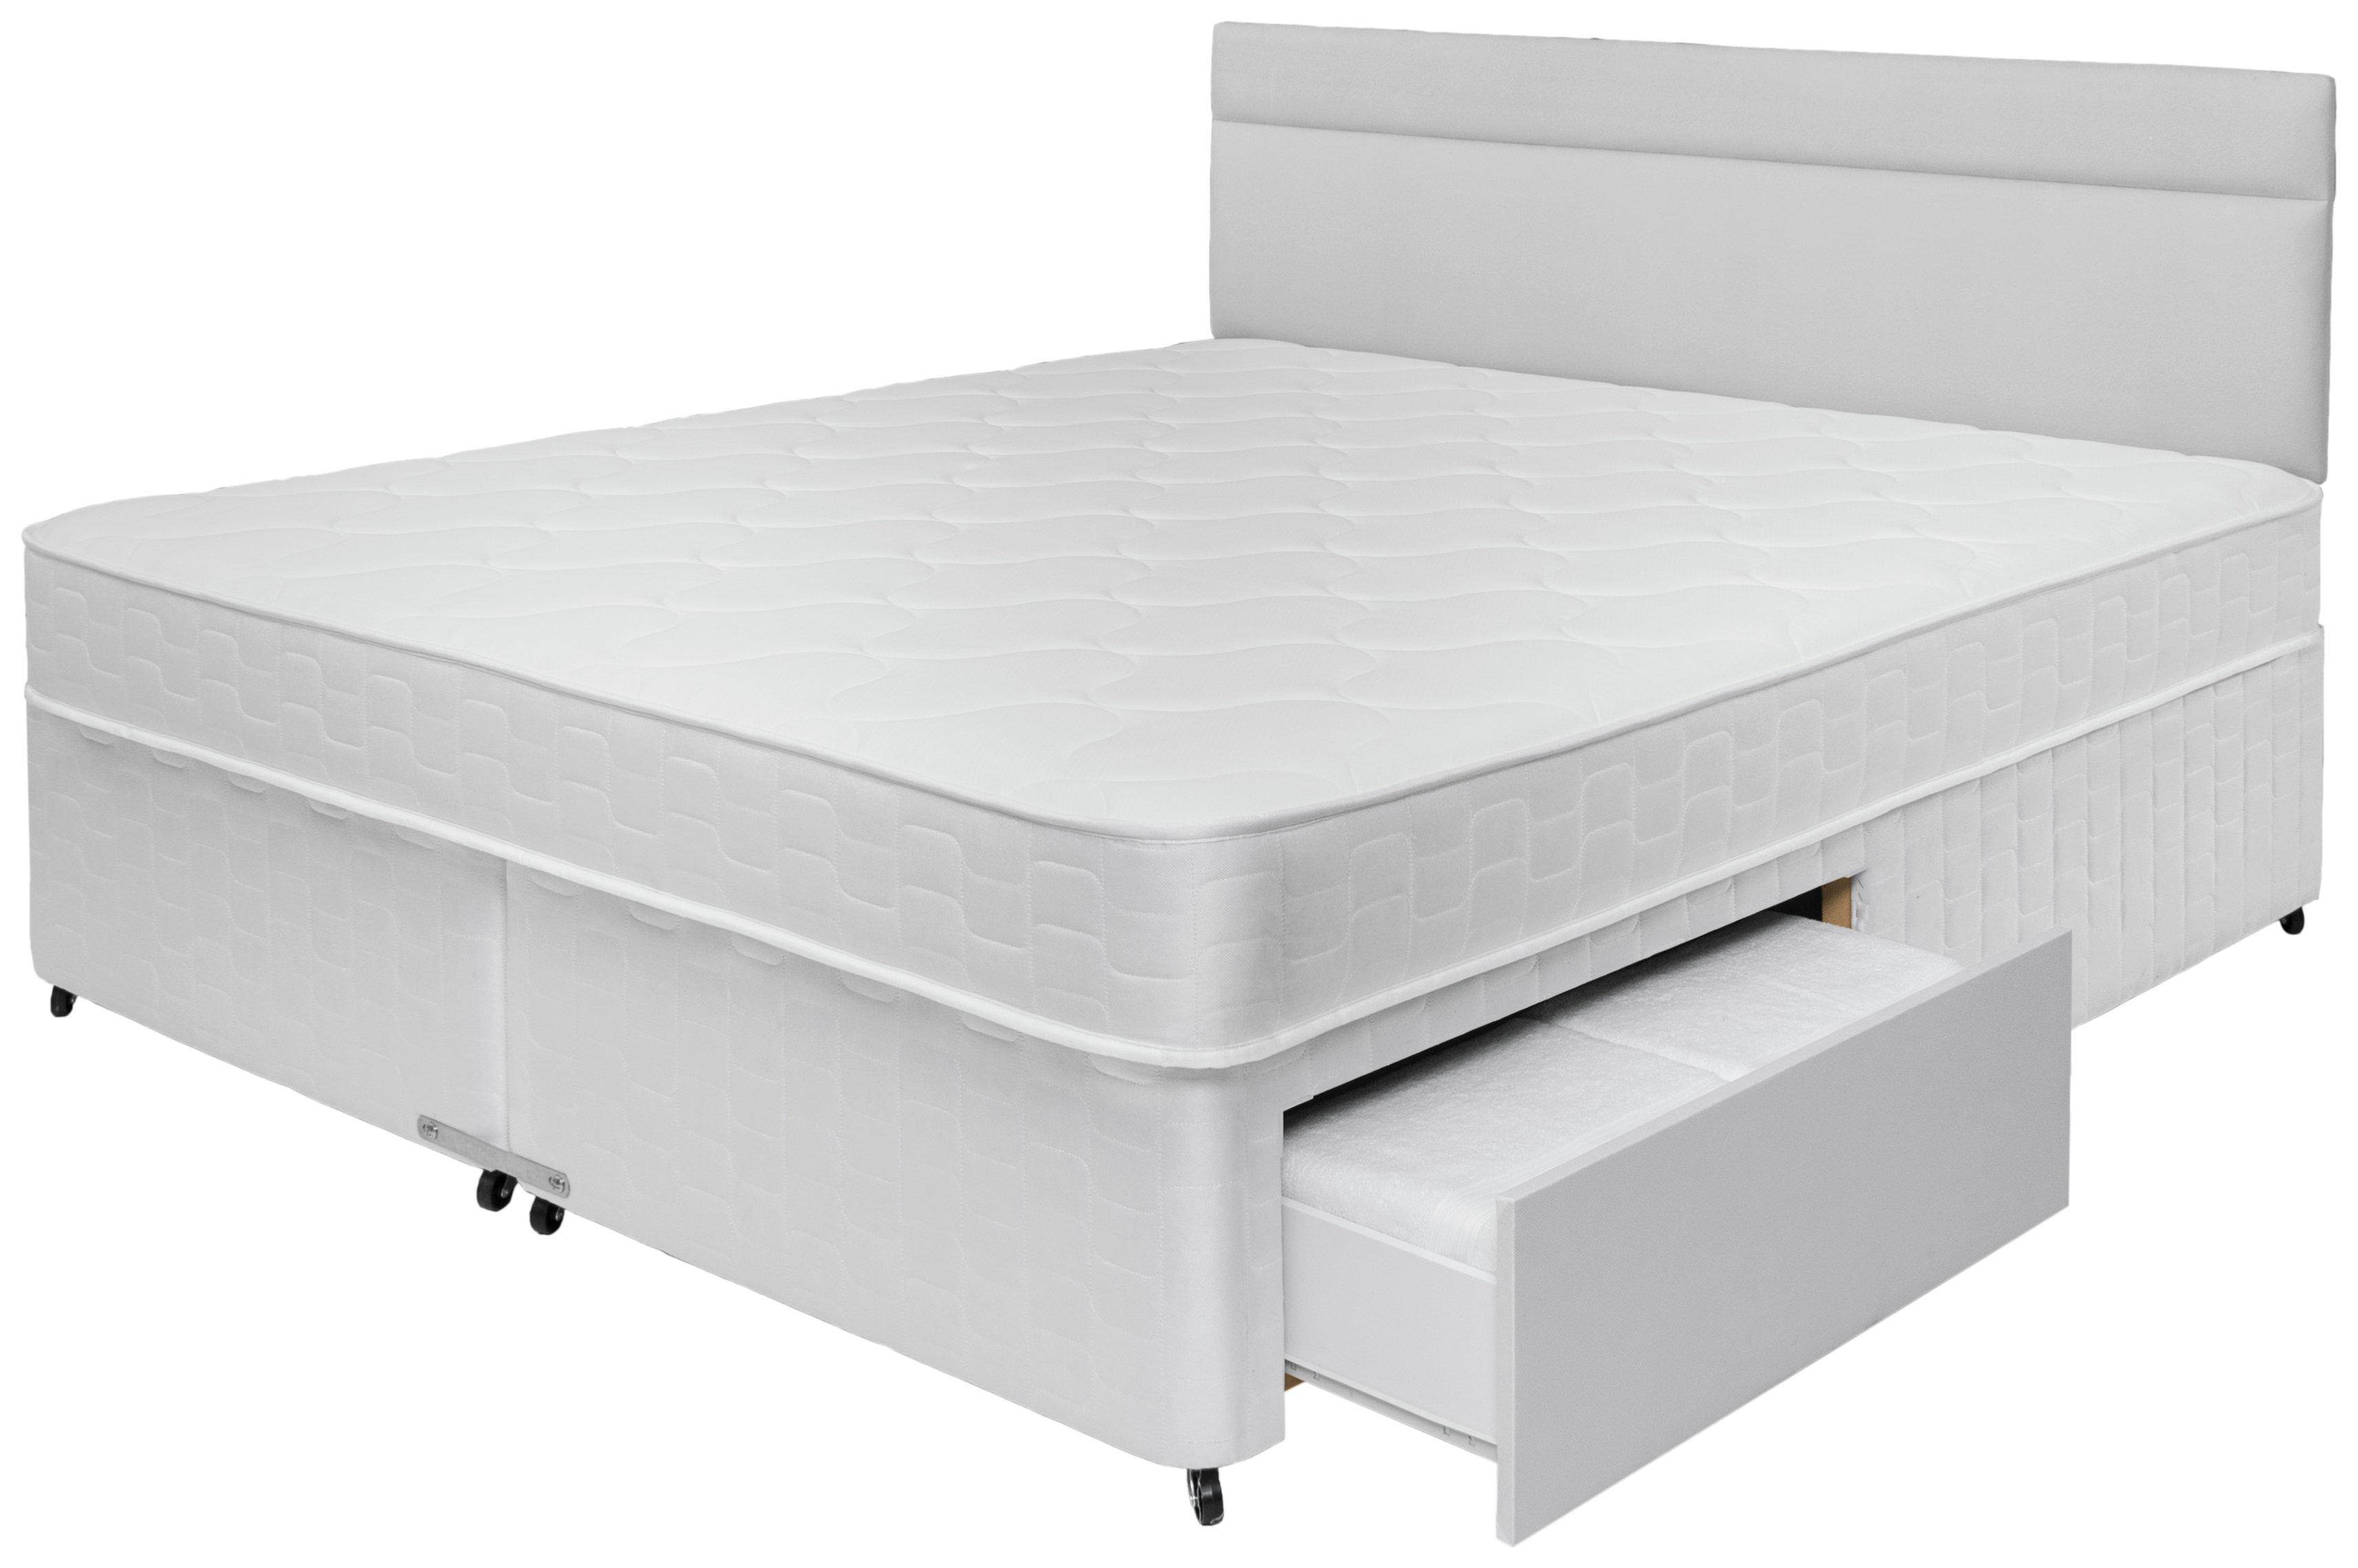 Airsprung royston memory foam 4 drawer divan superking for 4 drawer divan